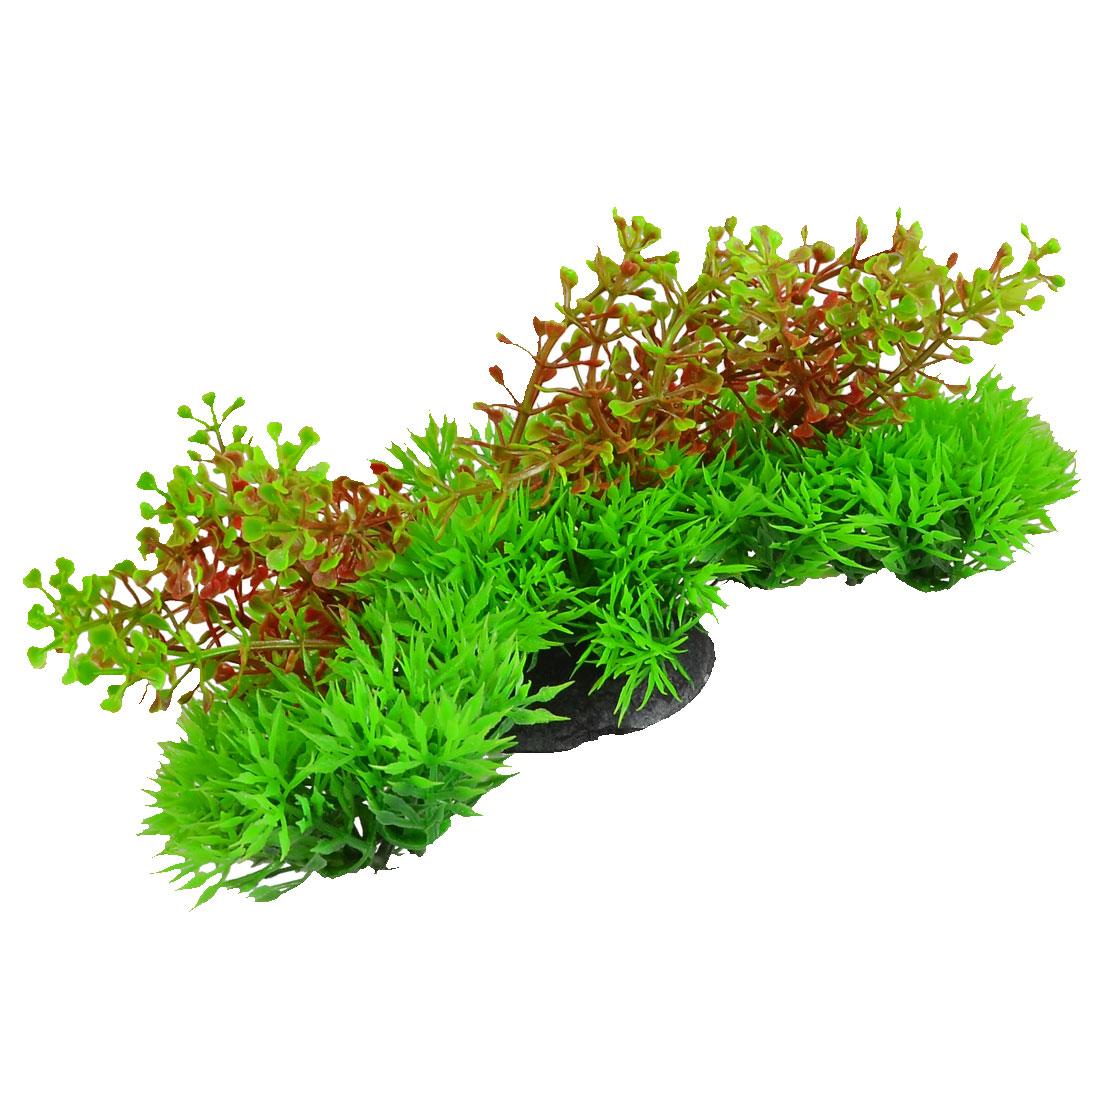 Fish Tank Aquarium Decor Plastic Green Amaranth Grass Plant 20cm Width